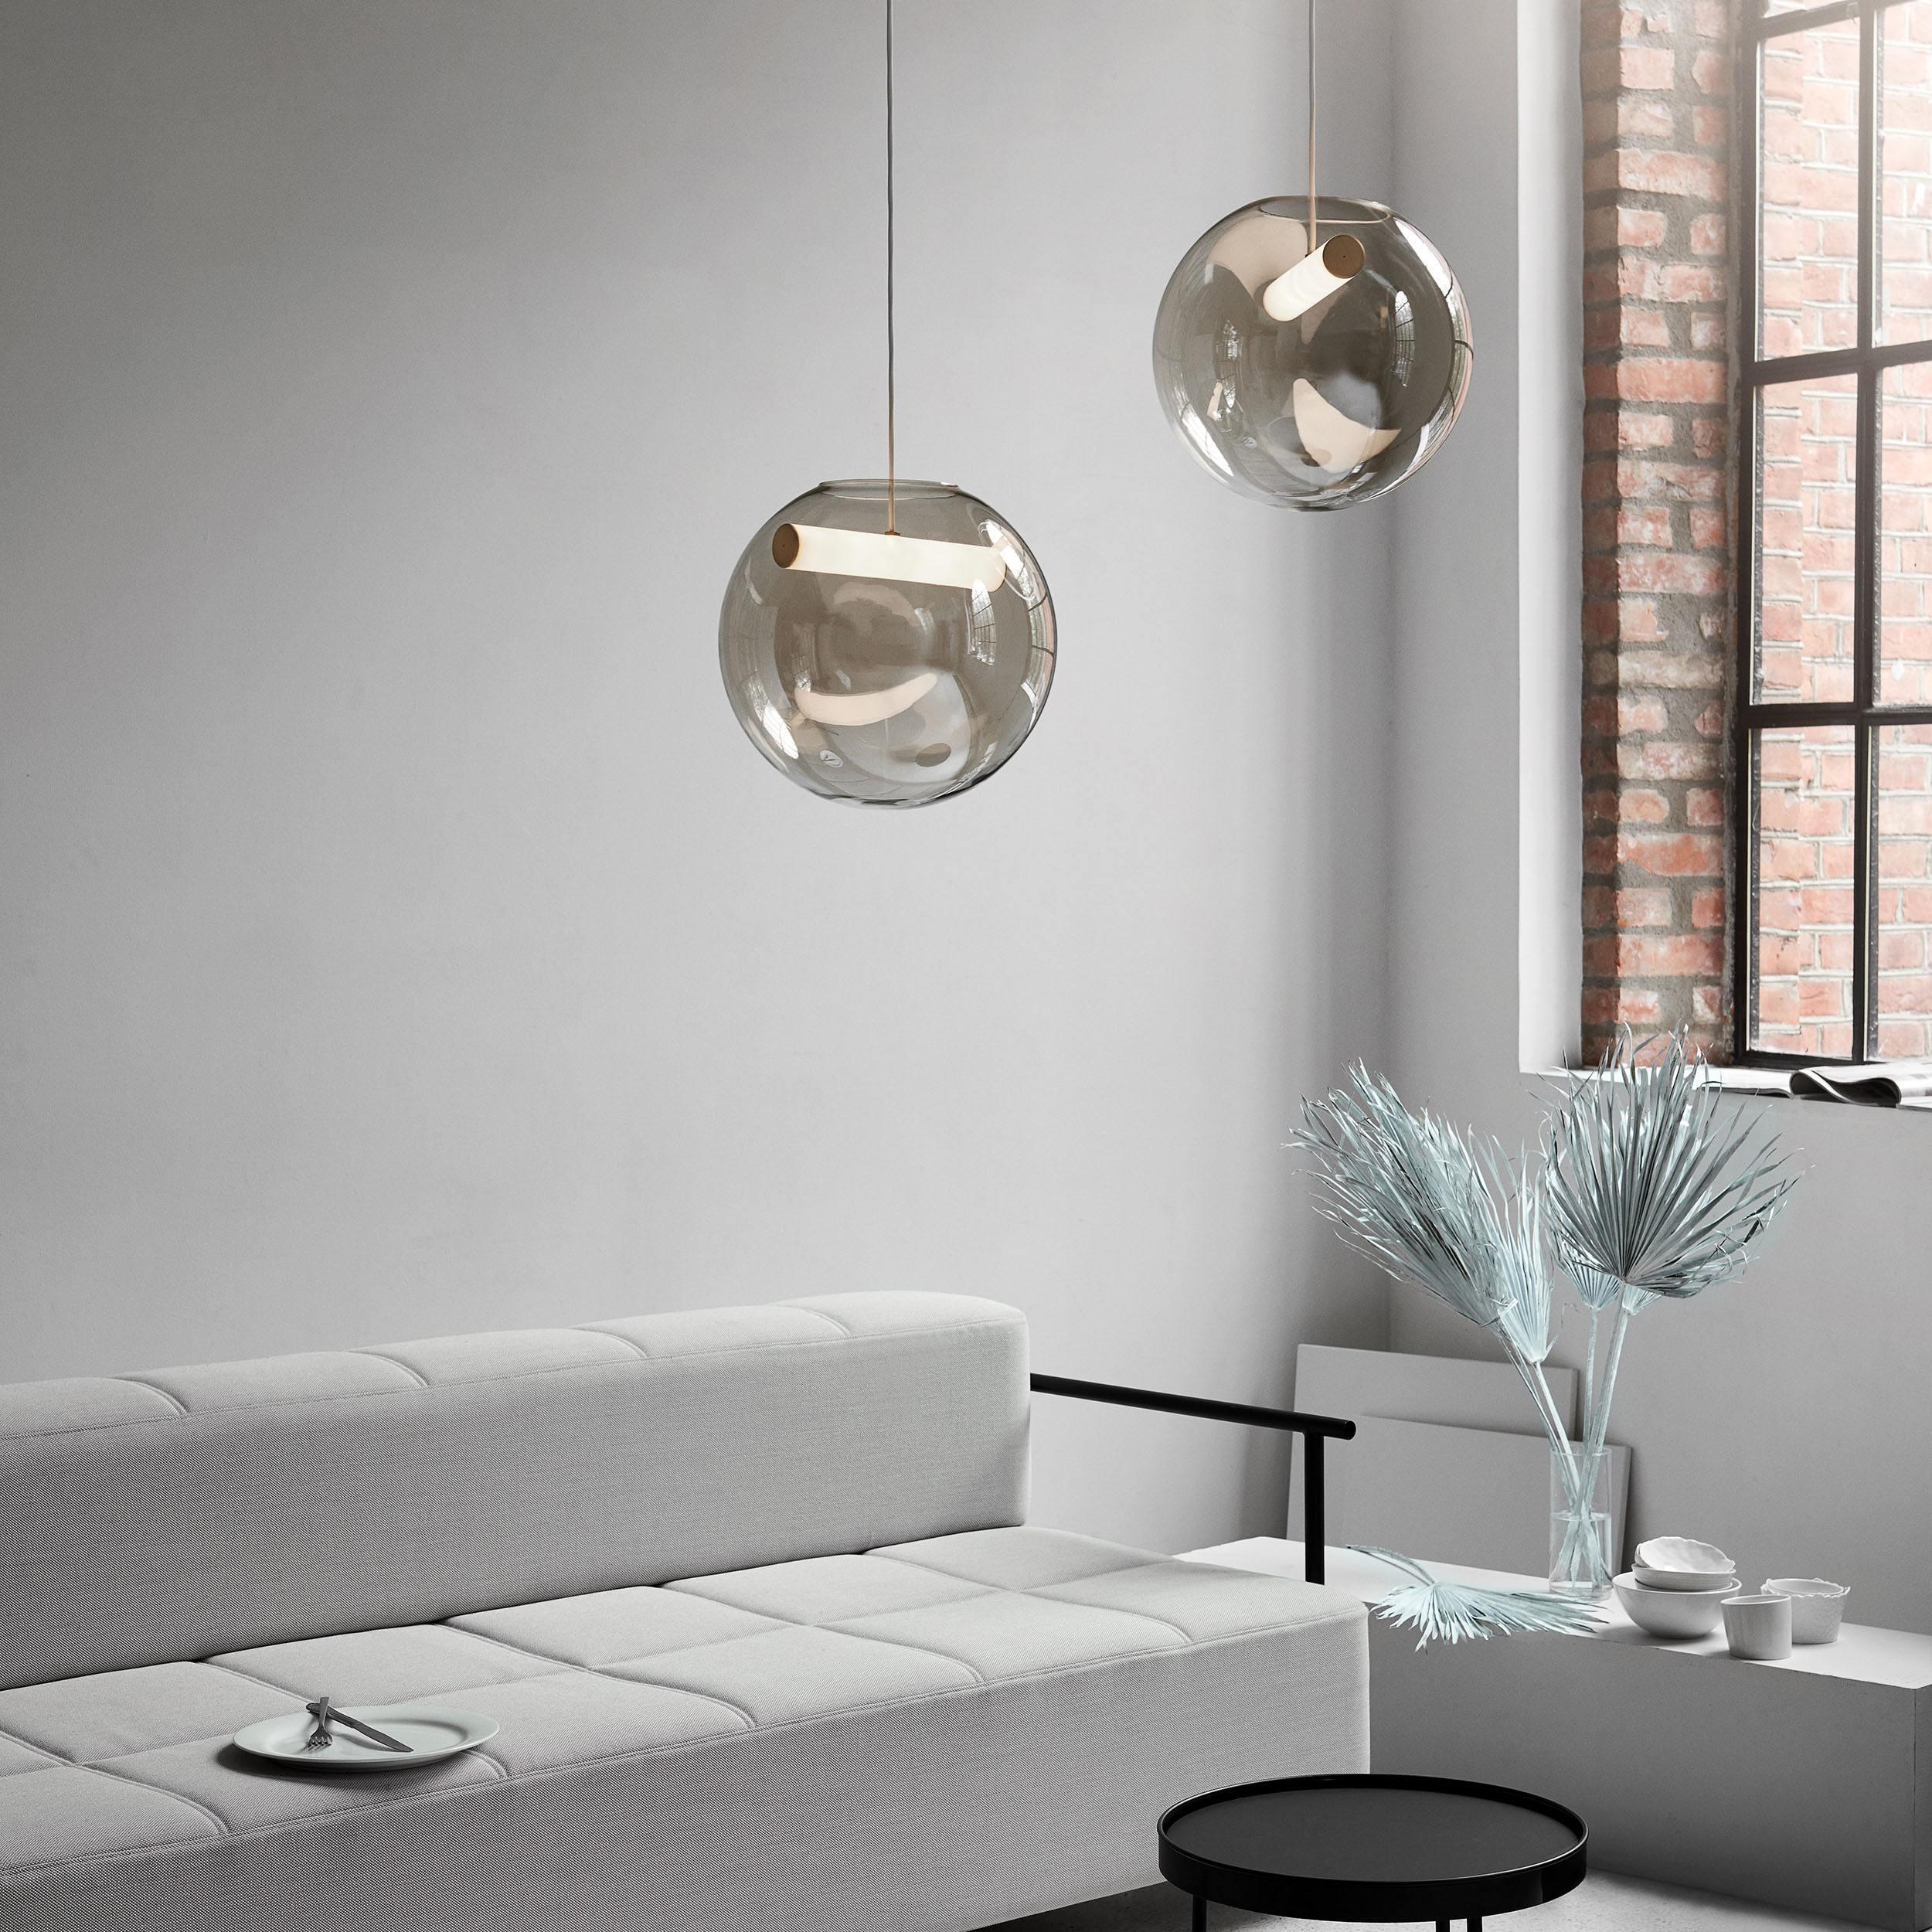 Reveal LED Pendelleuchte